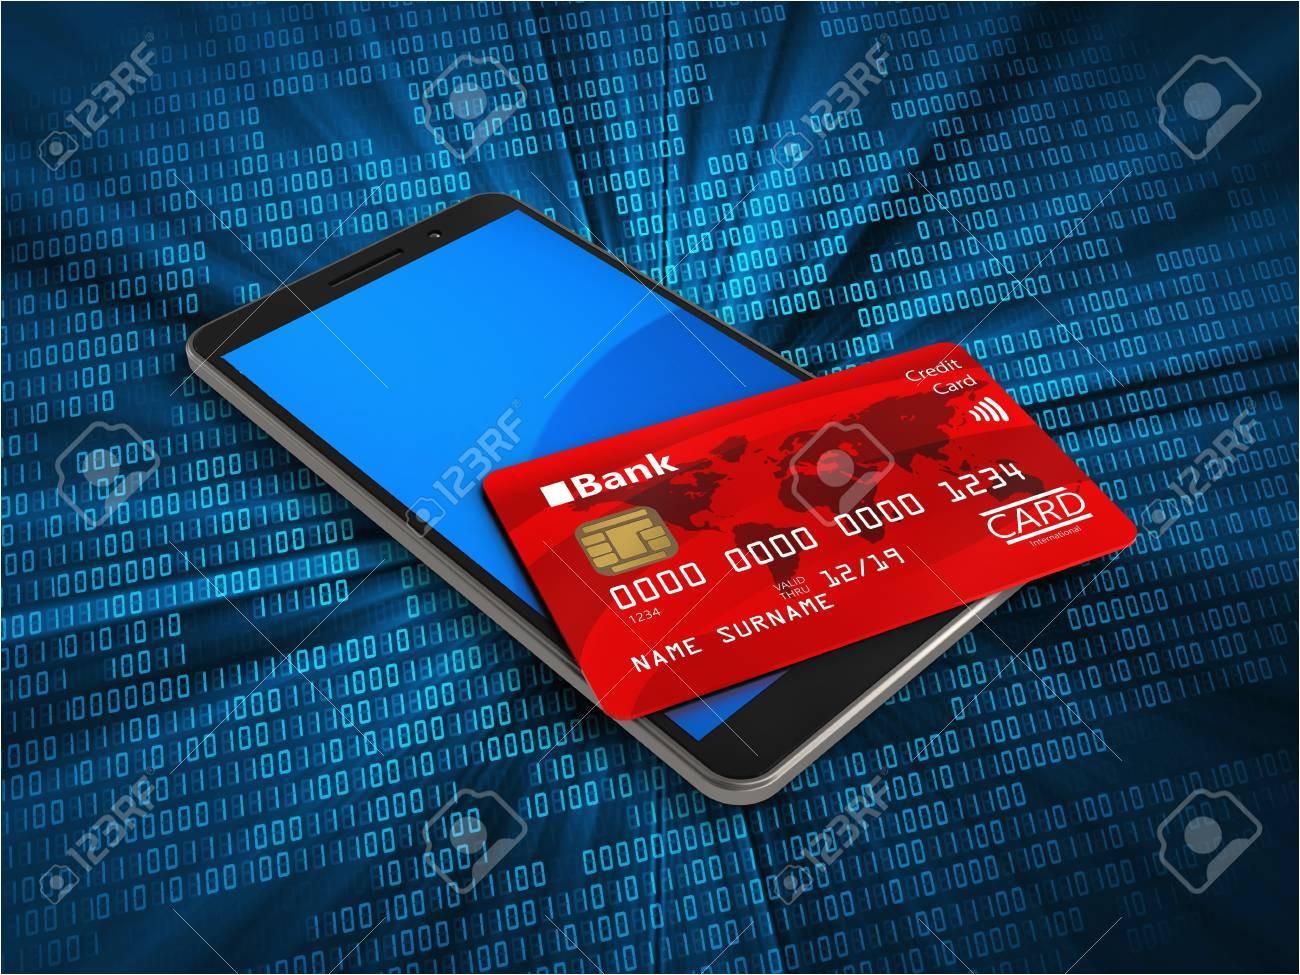 83097012 3d illustration of mobile phone over digital background with credit card jpg